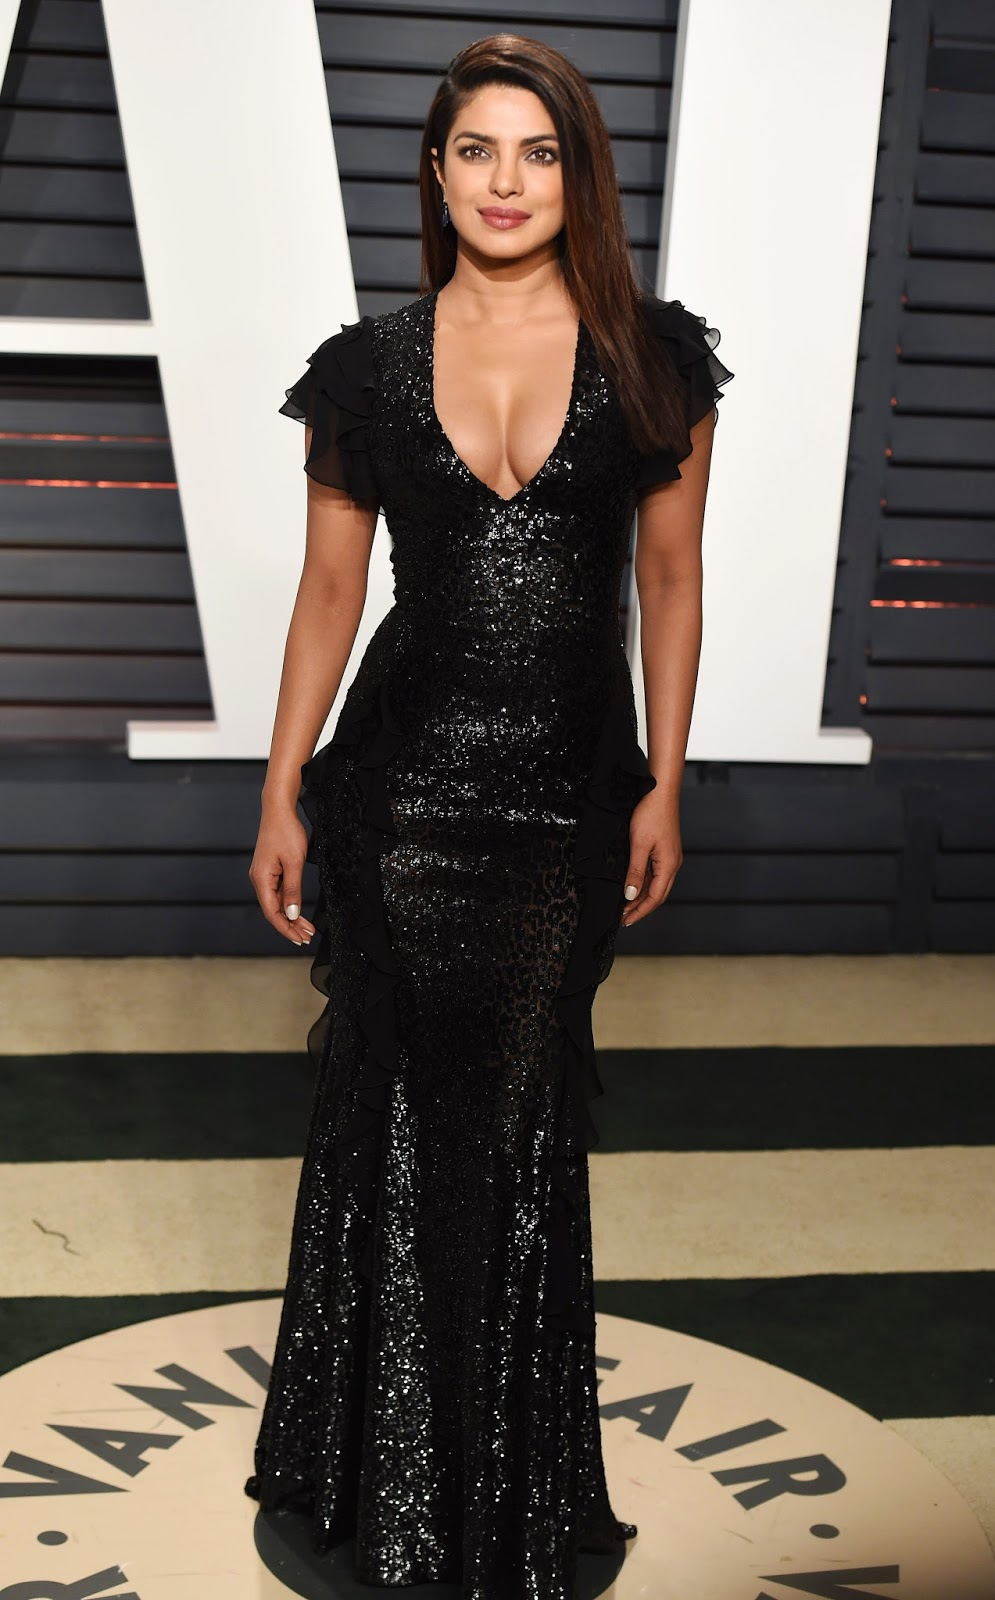 Priyanka Chopra Super Sexy Cleavage Show In Black Dress At ...